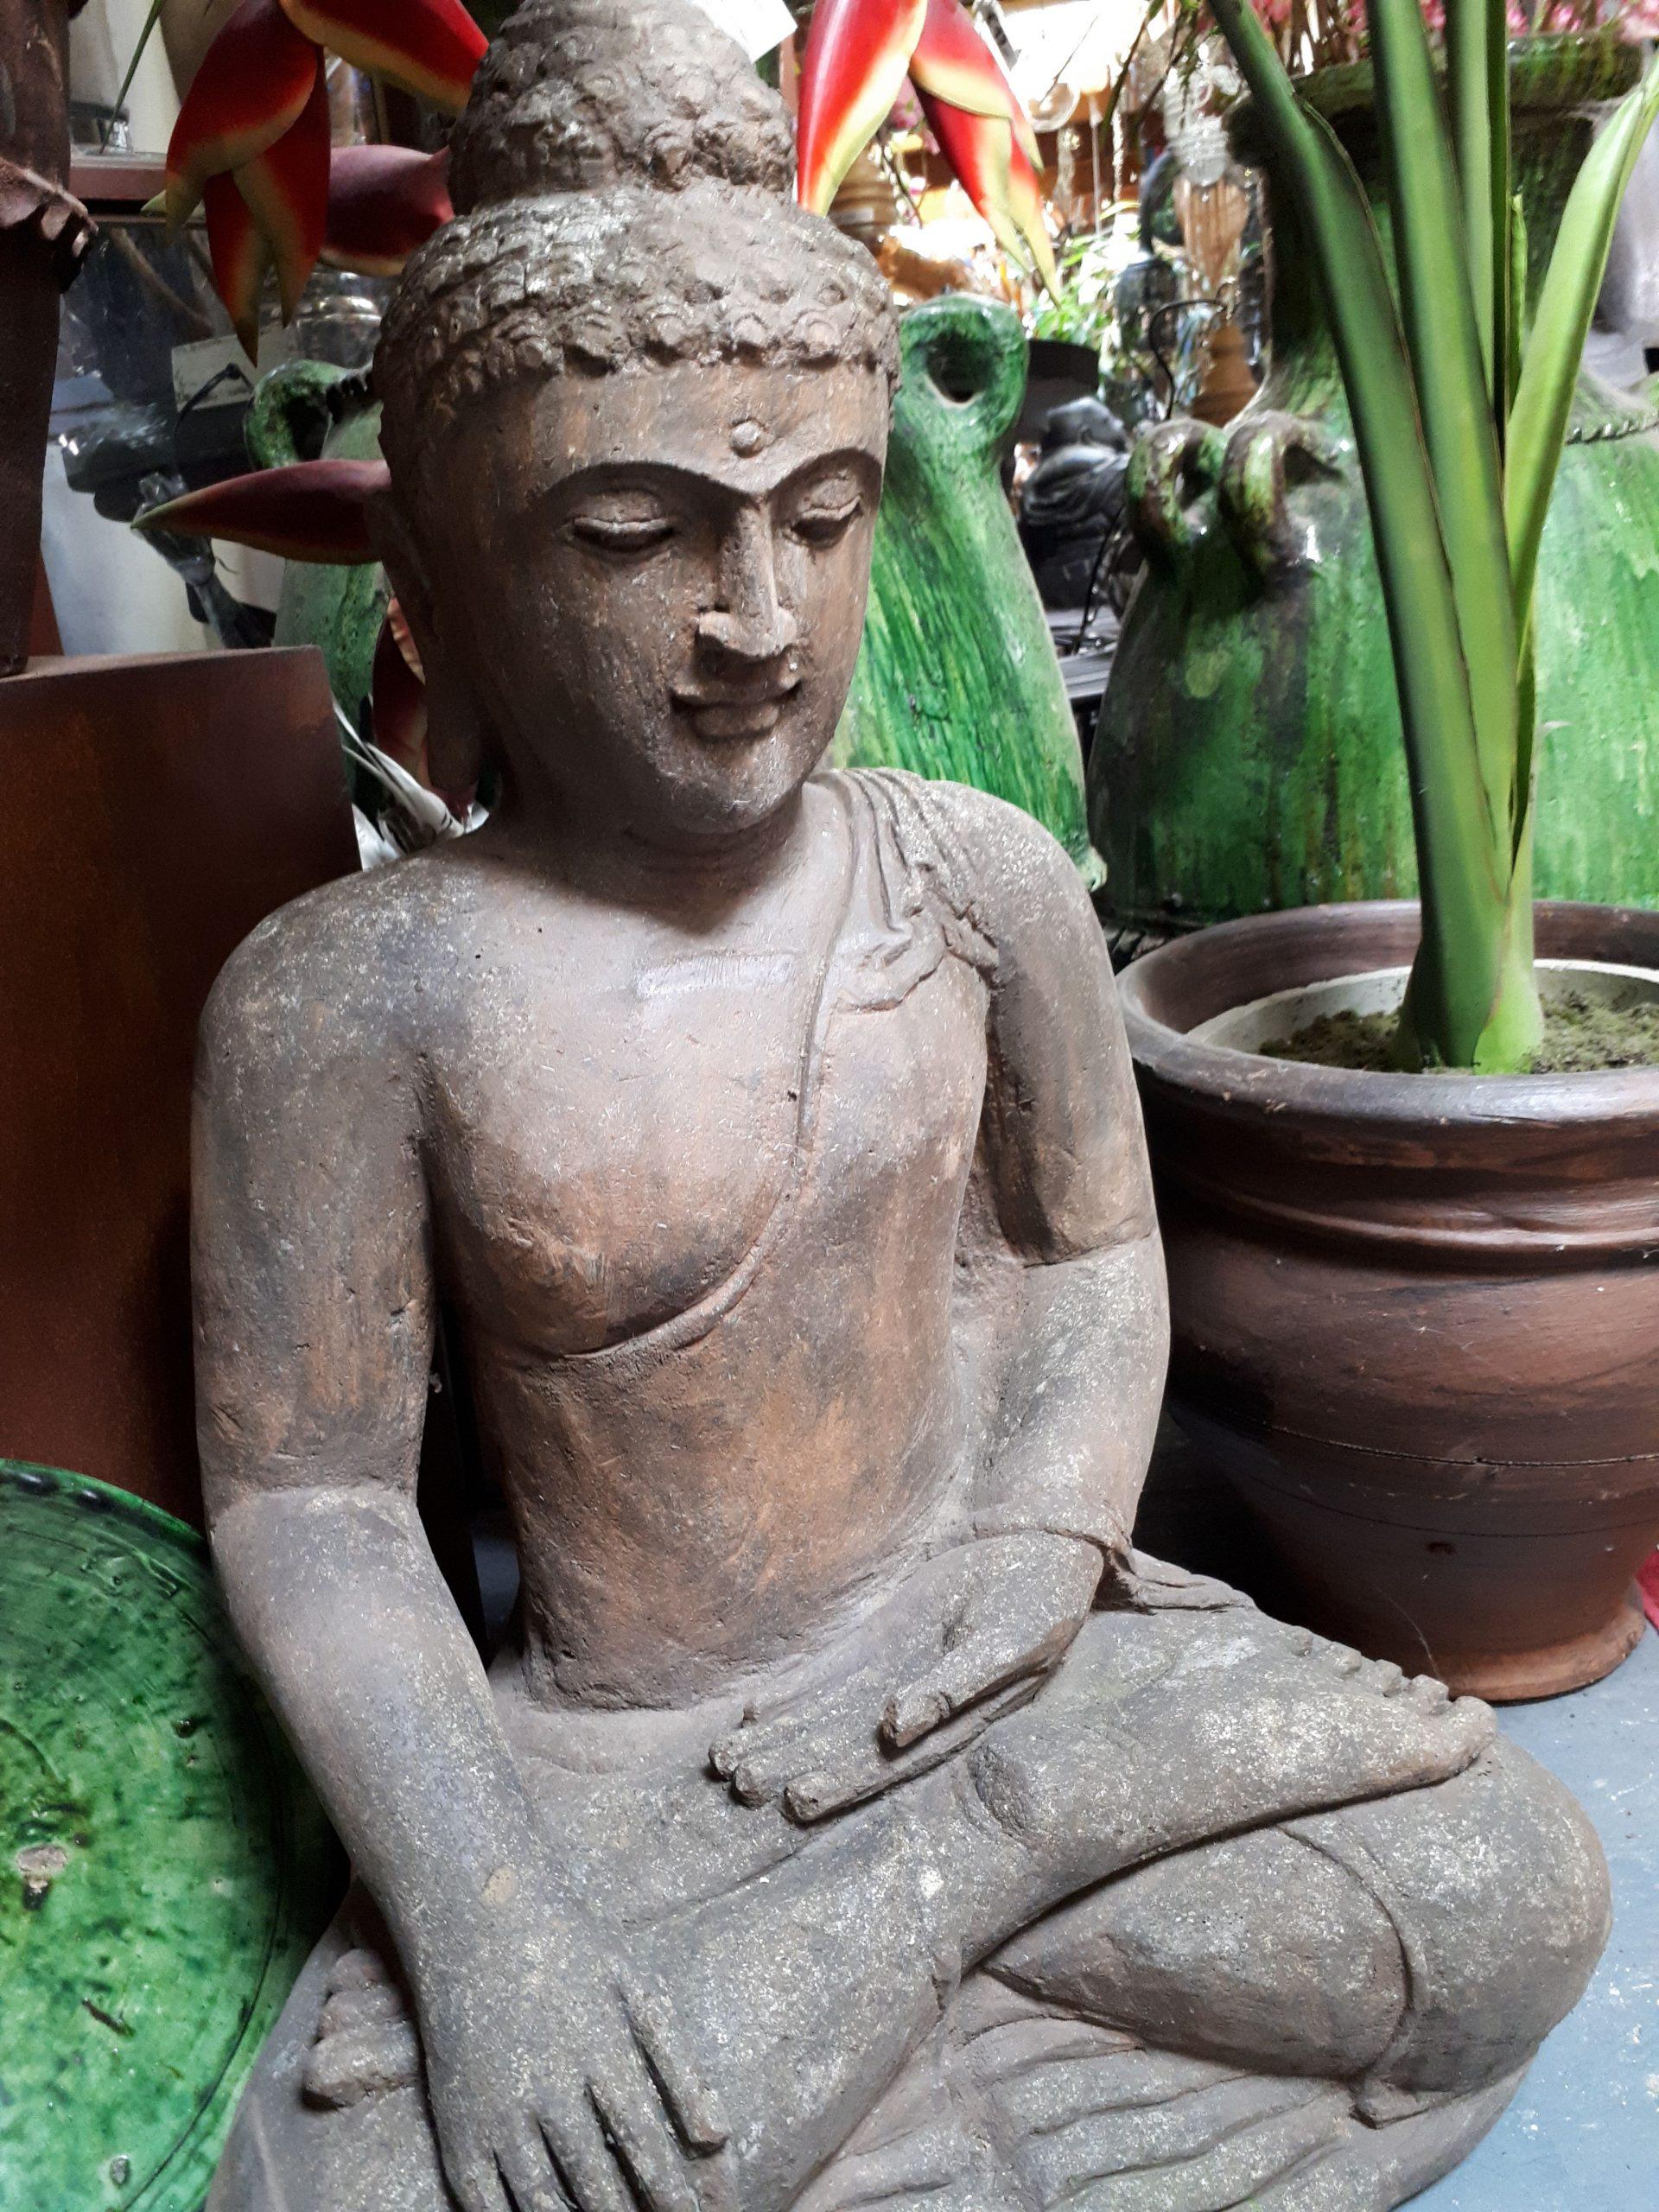 Basanit Lava Buddha Sitzend 180 Kg 1M € 590.- | Buddha ... dedans Statue Moaï 1M